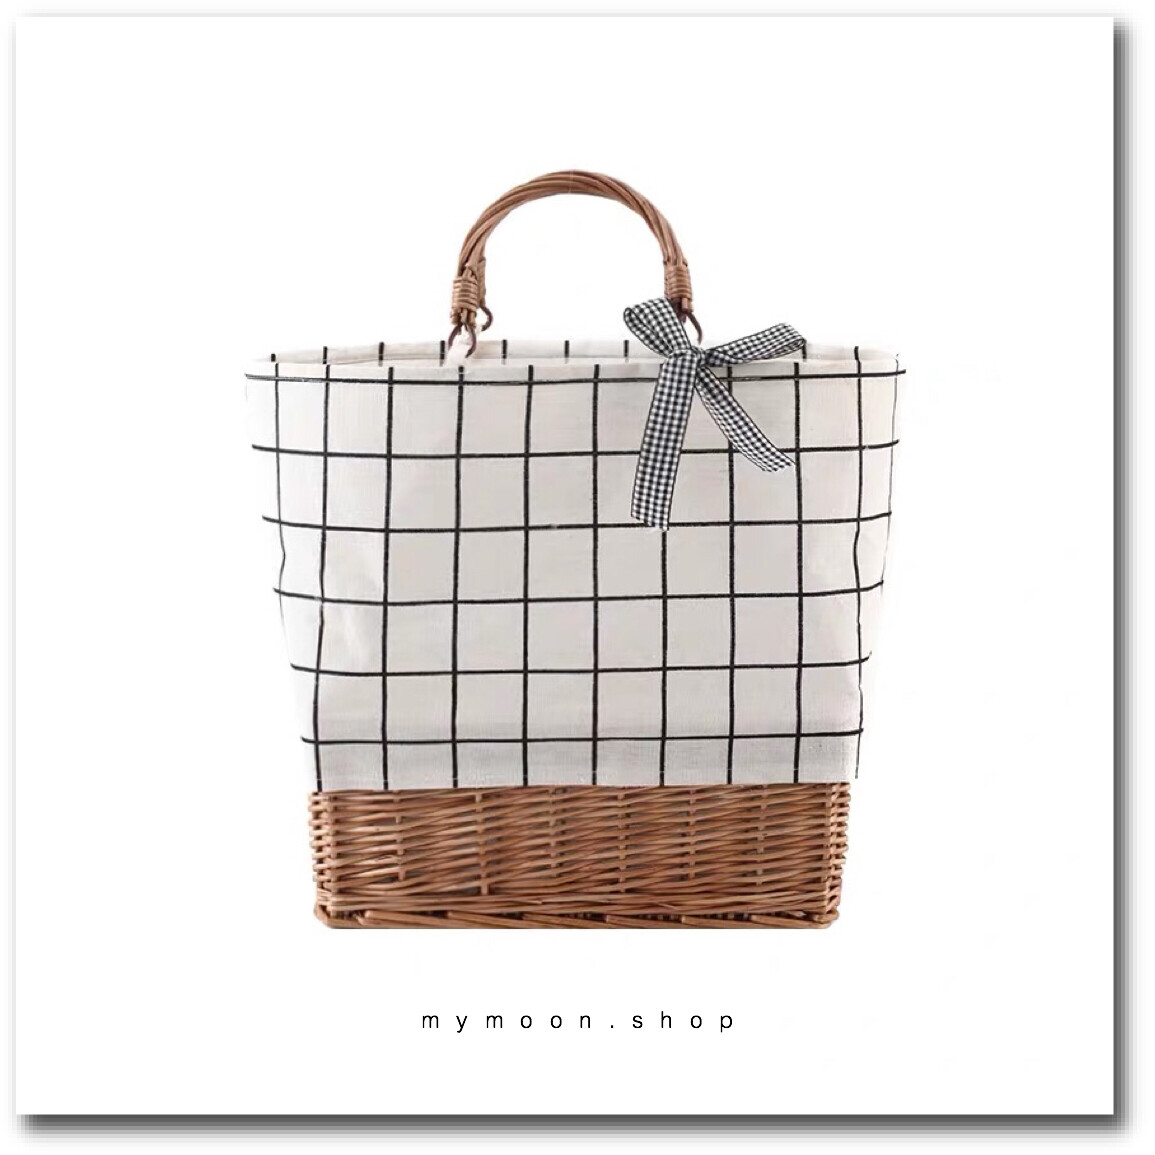 Willow Woven bag combination with fabric stitching ลายตารางขาวดำ